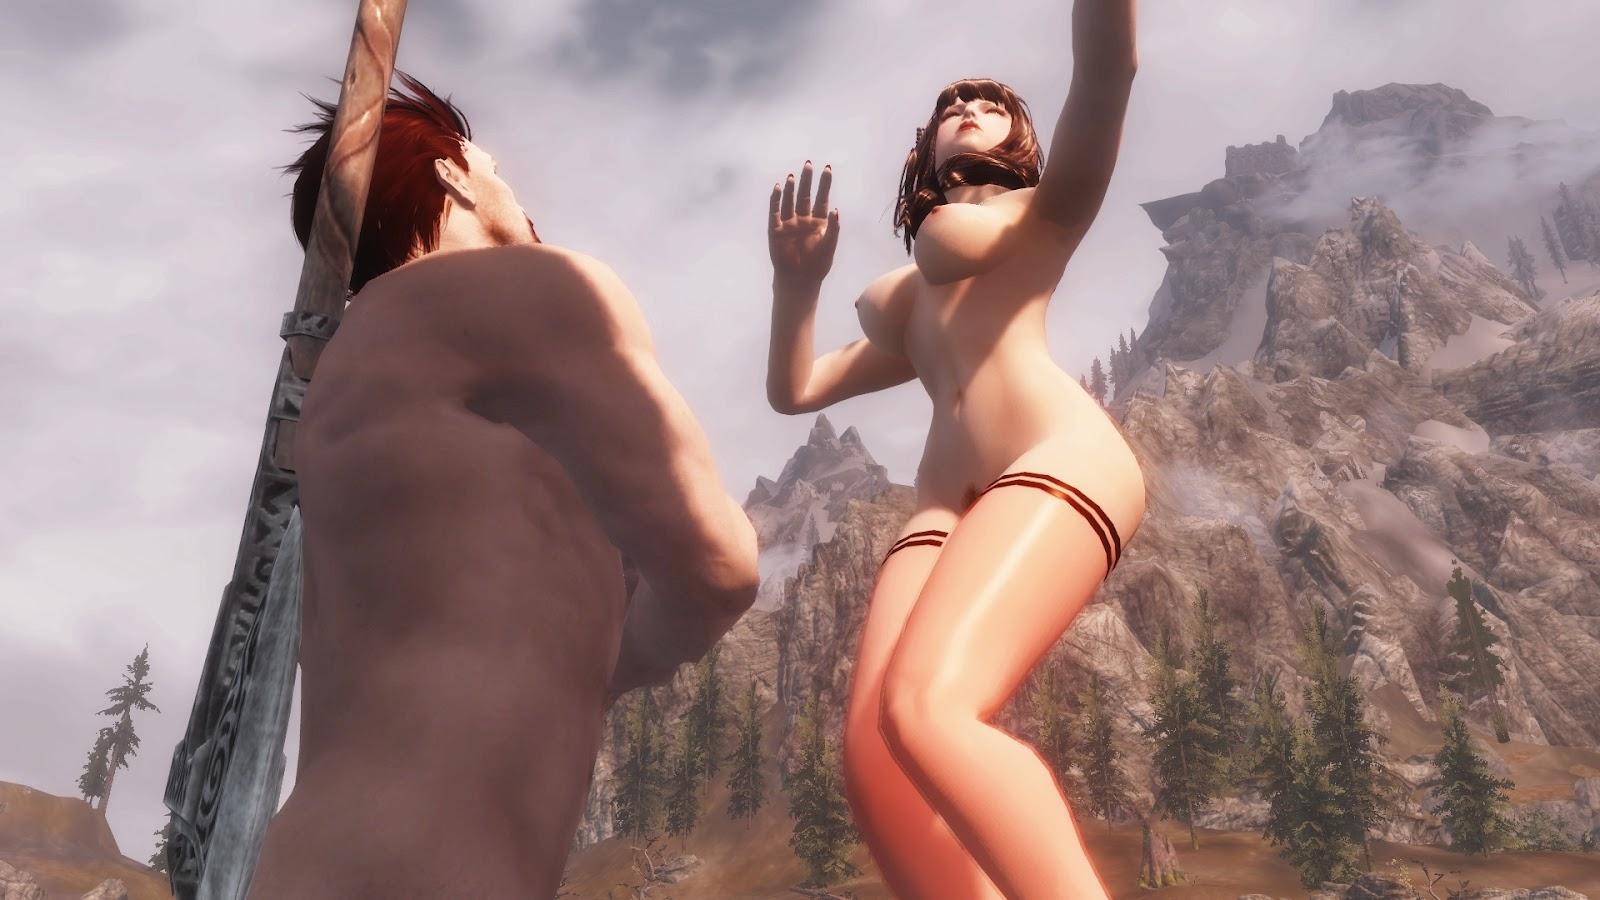 Skyrim adult mods nude anime galleries